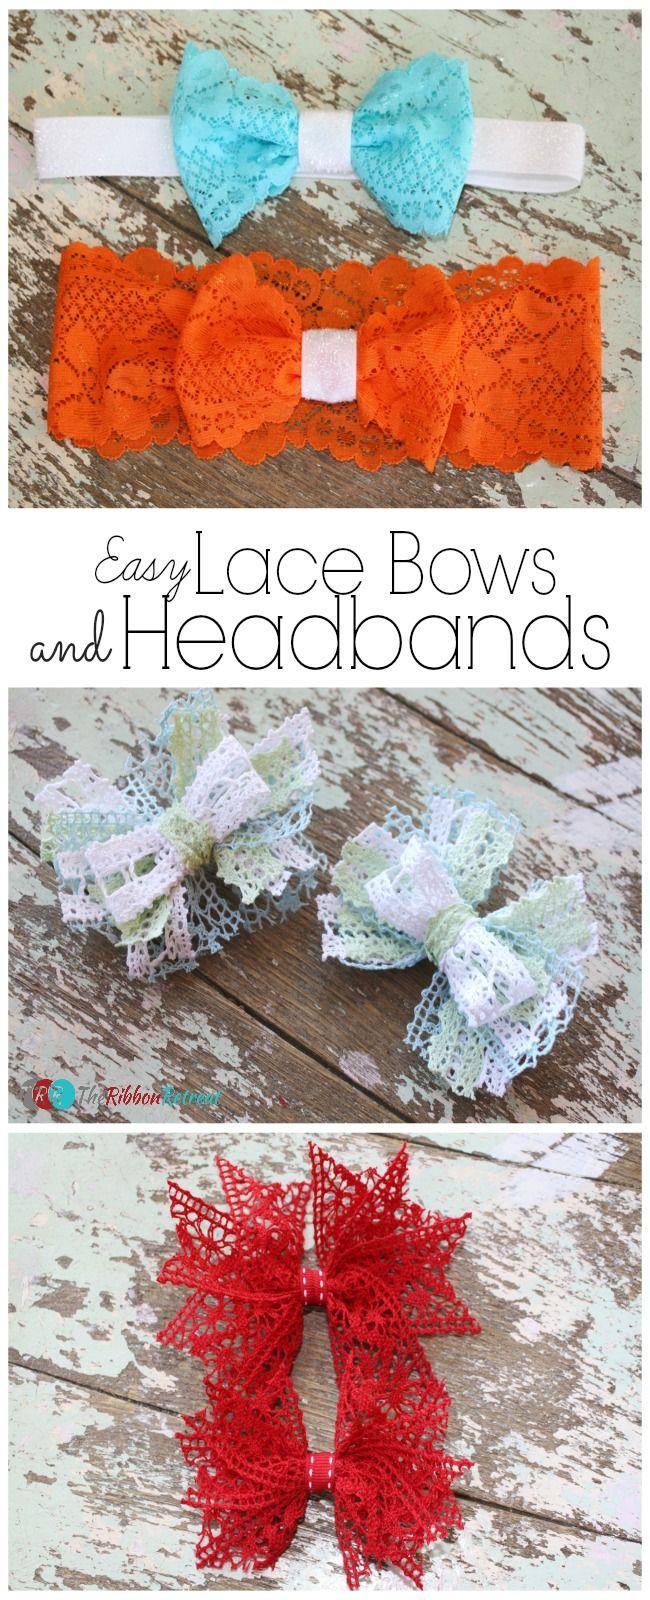 Easy Lace Bows and Headbands - The Ribbon Retreat Blog